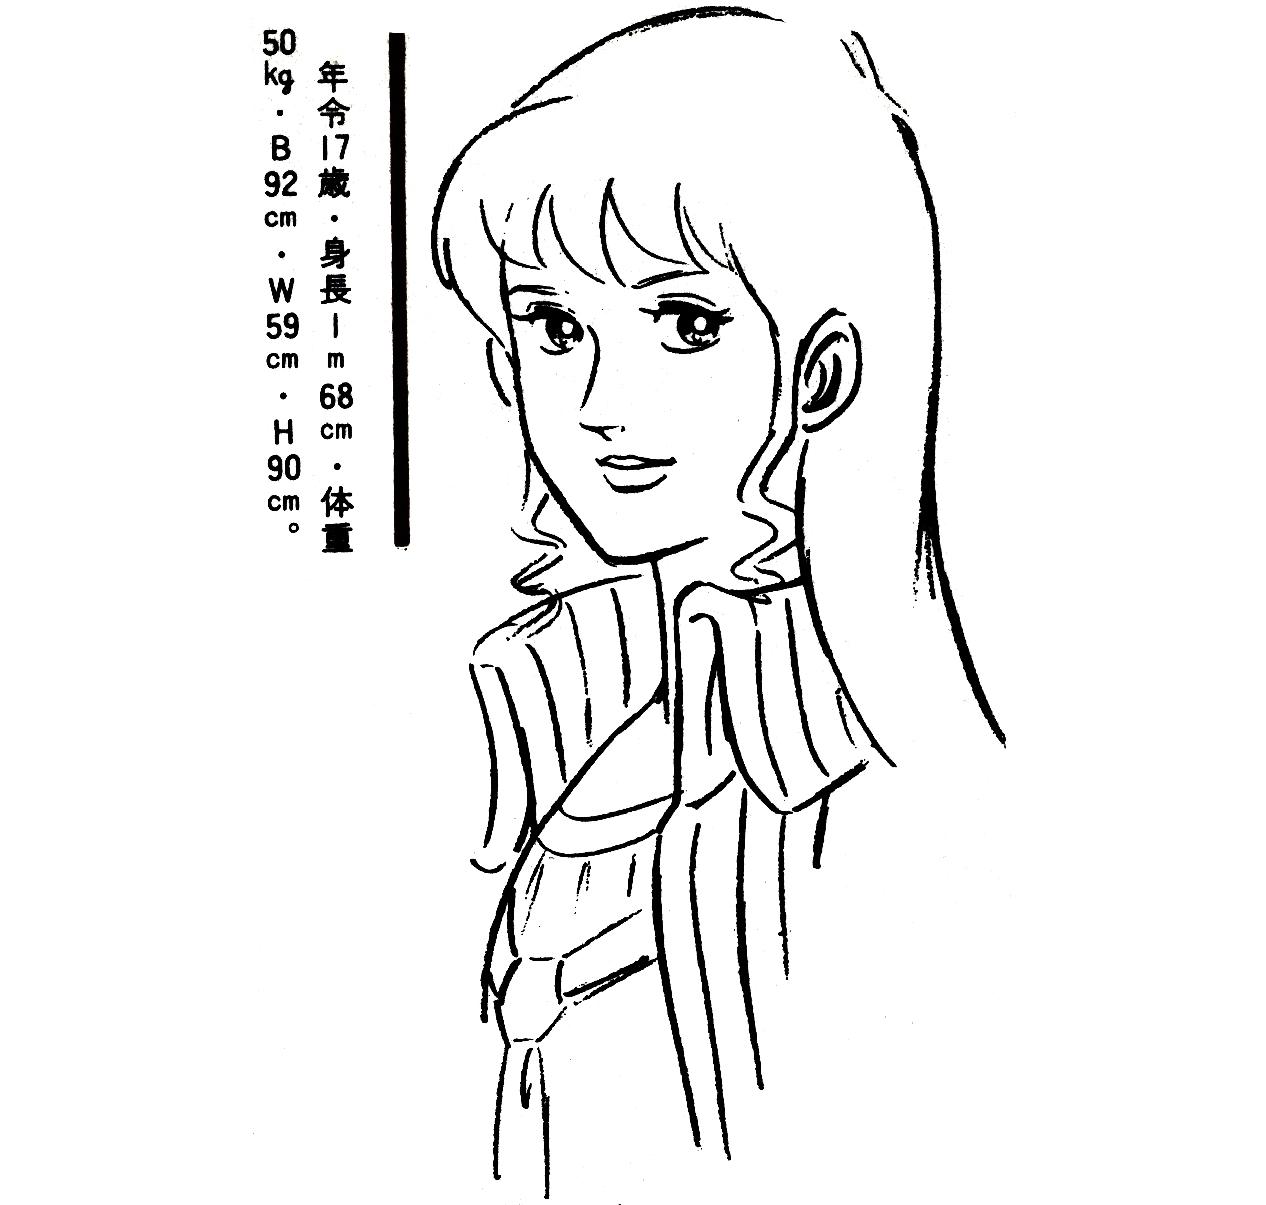 Daitarn3_settei_schizzi_014.jpg